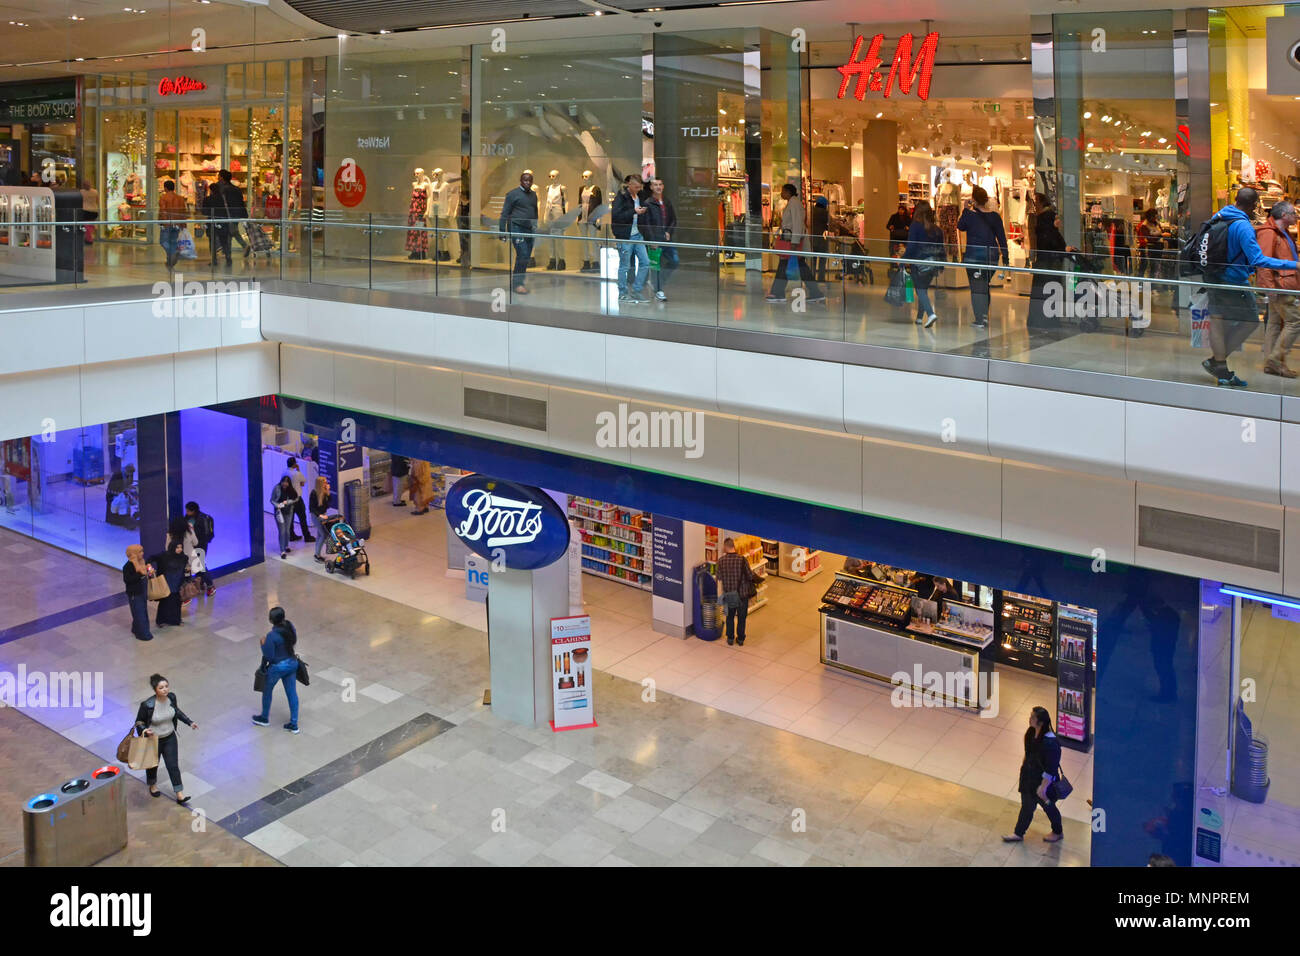 Stratford Westfield shopping centre